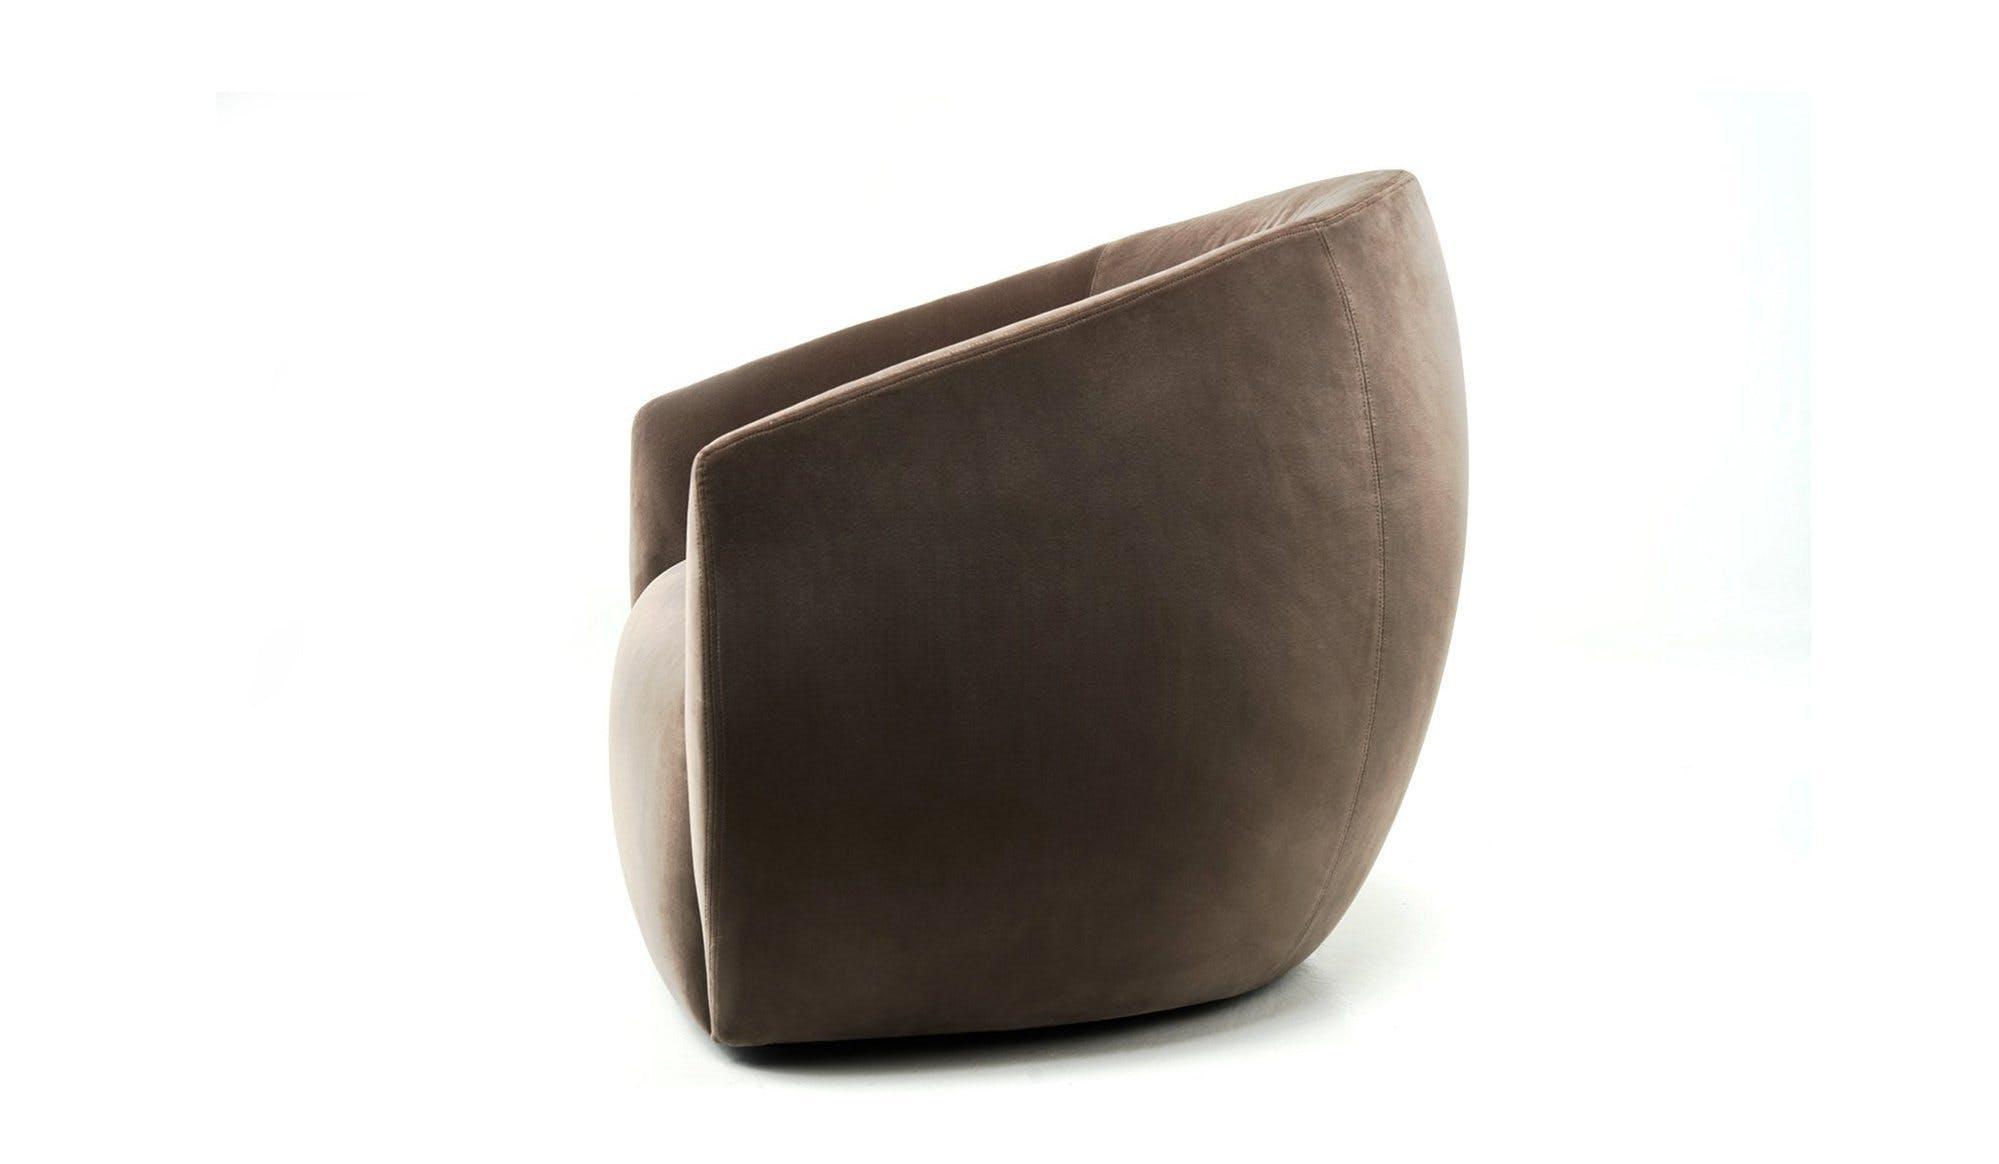 Wendelbo-side-couch-lobby-haute-living